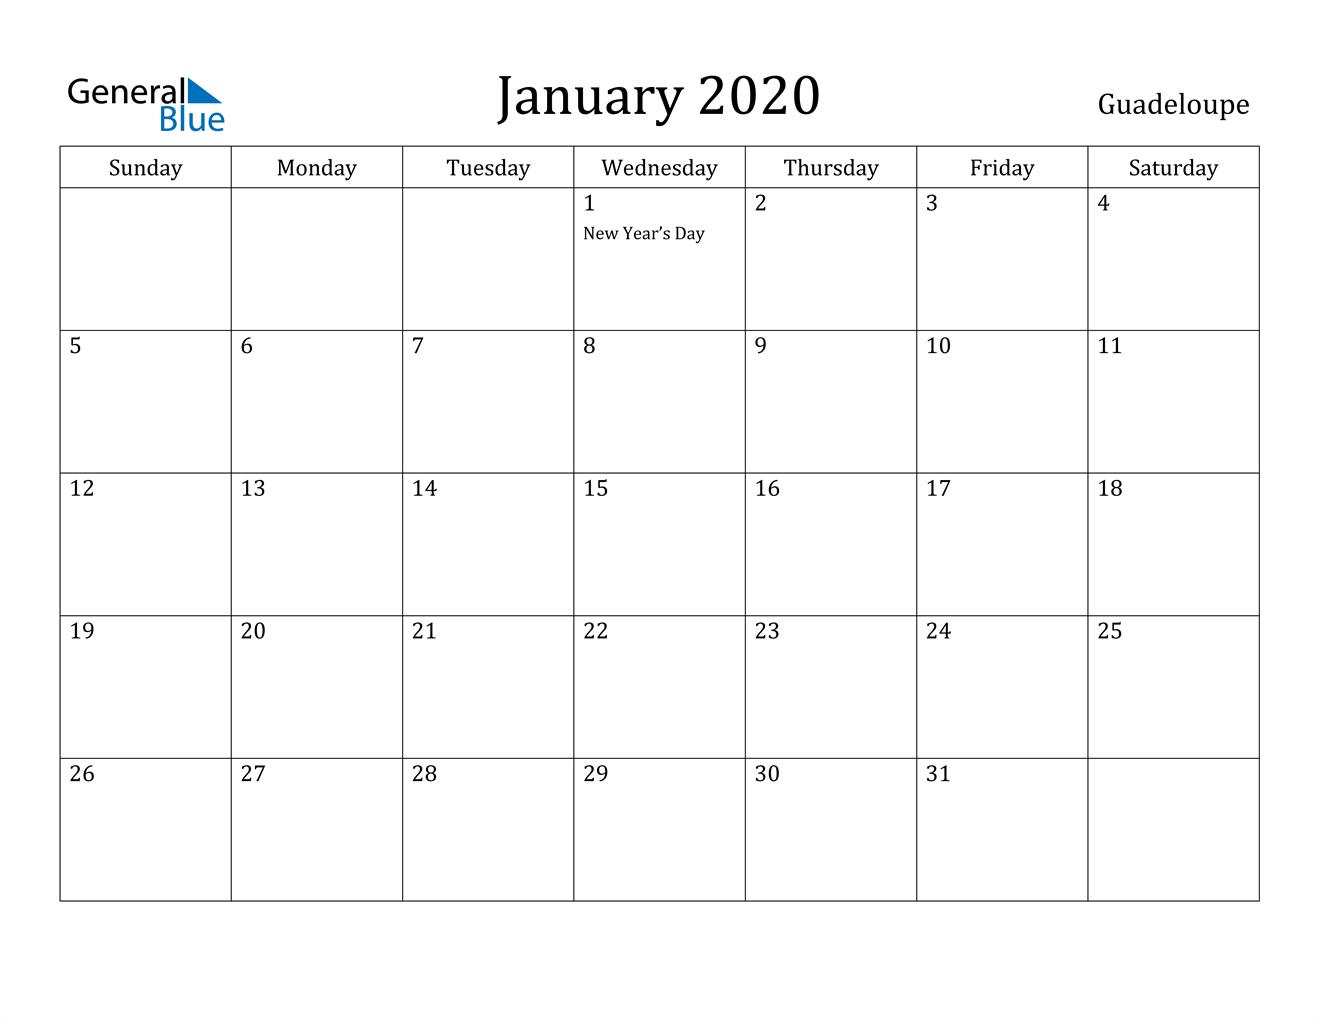 Image of January 2020 Guadeloupe Calendar with Holidays Calendar